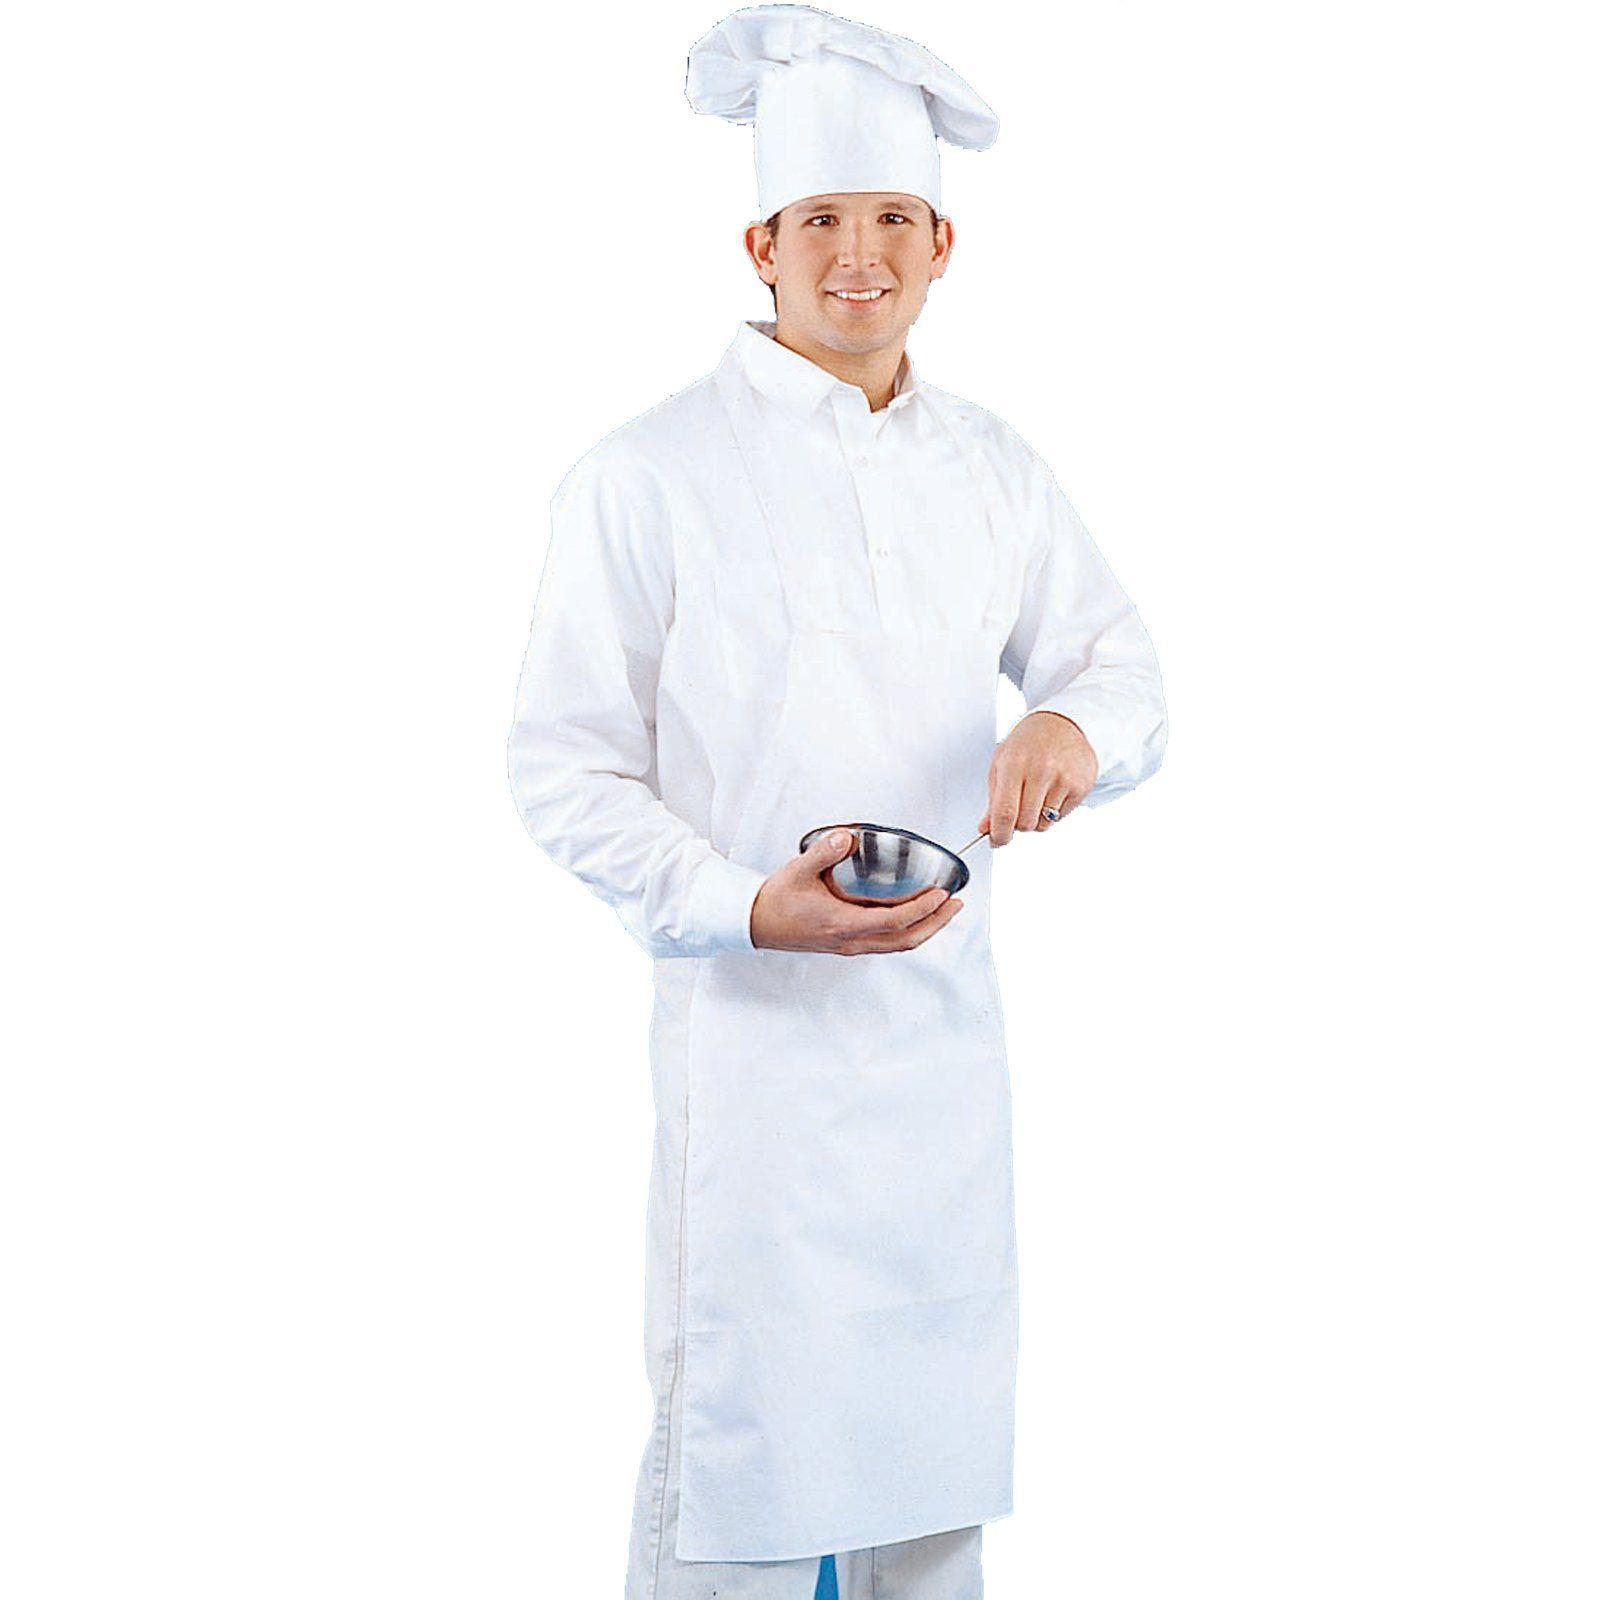 White apron chef fresno - Peter Alan Chef Hat And Apron Set